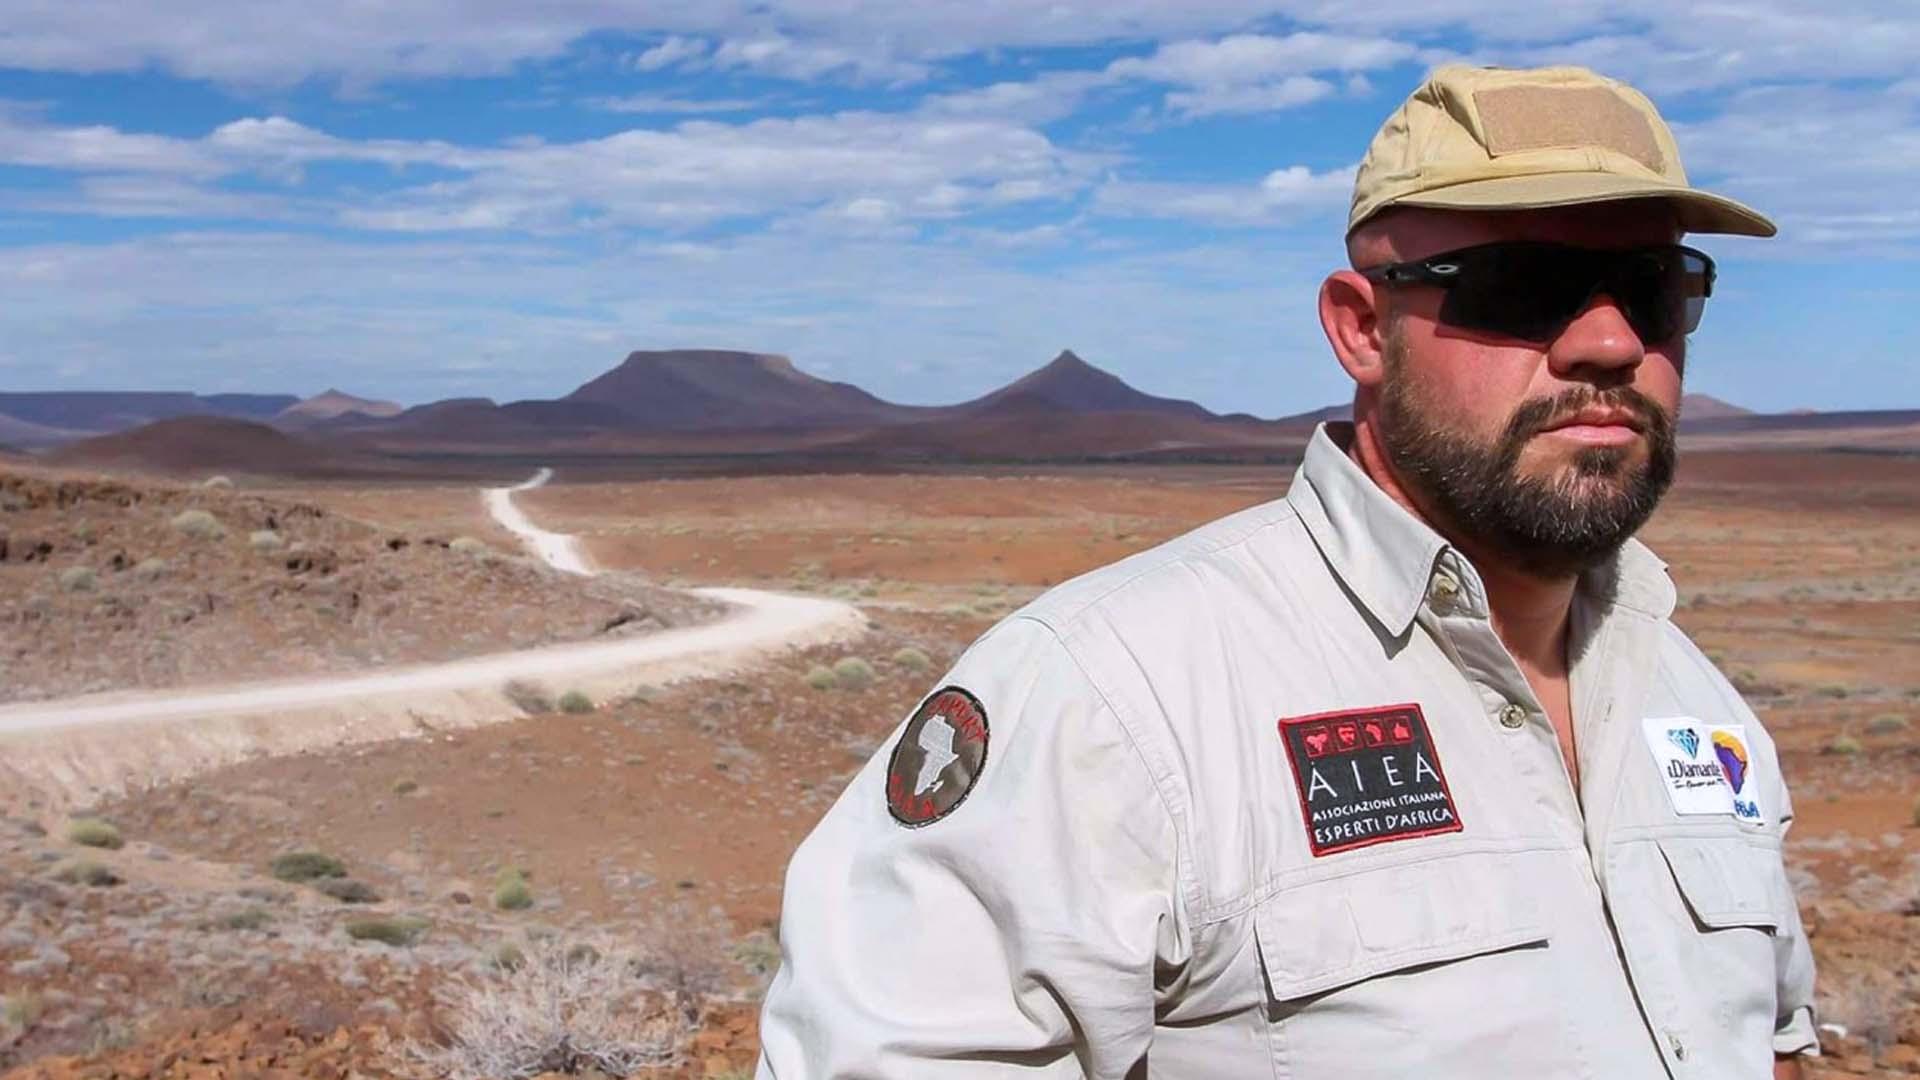 Davide Bomben istruice chi combatte i bracconieri in Africa